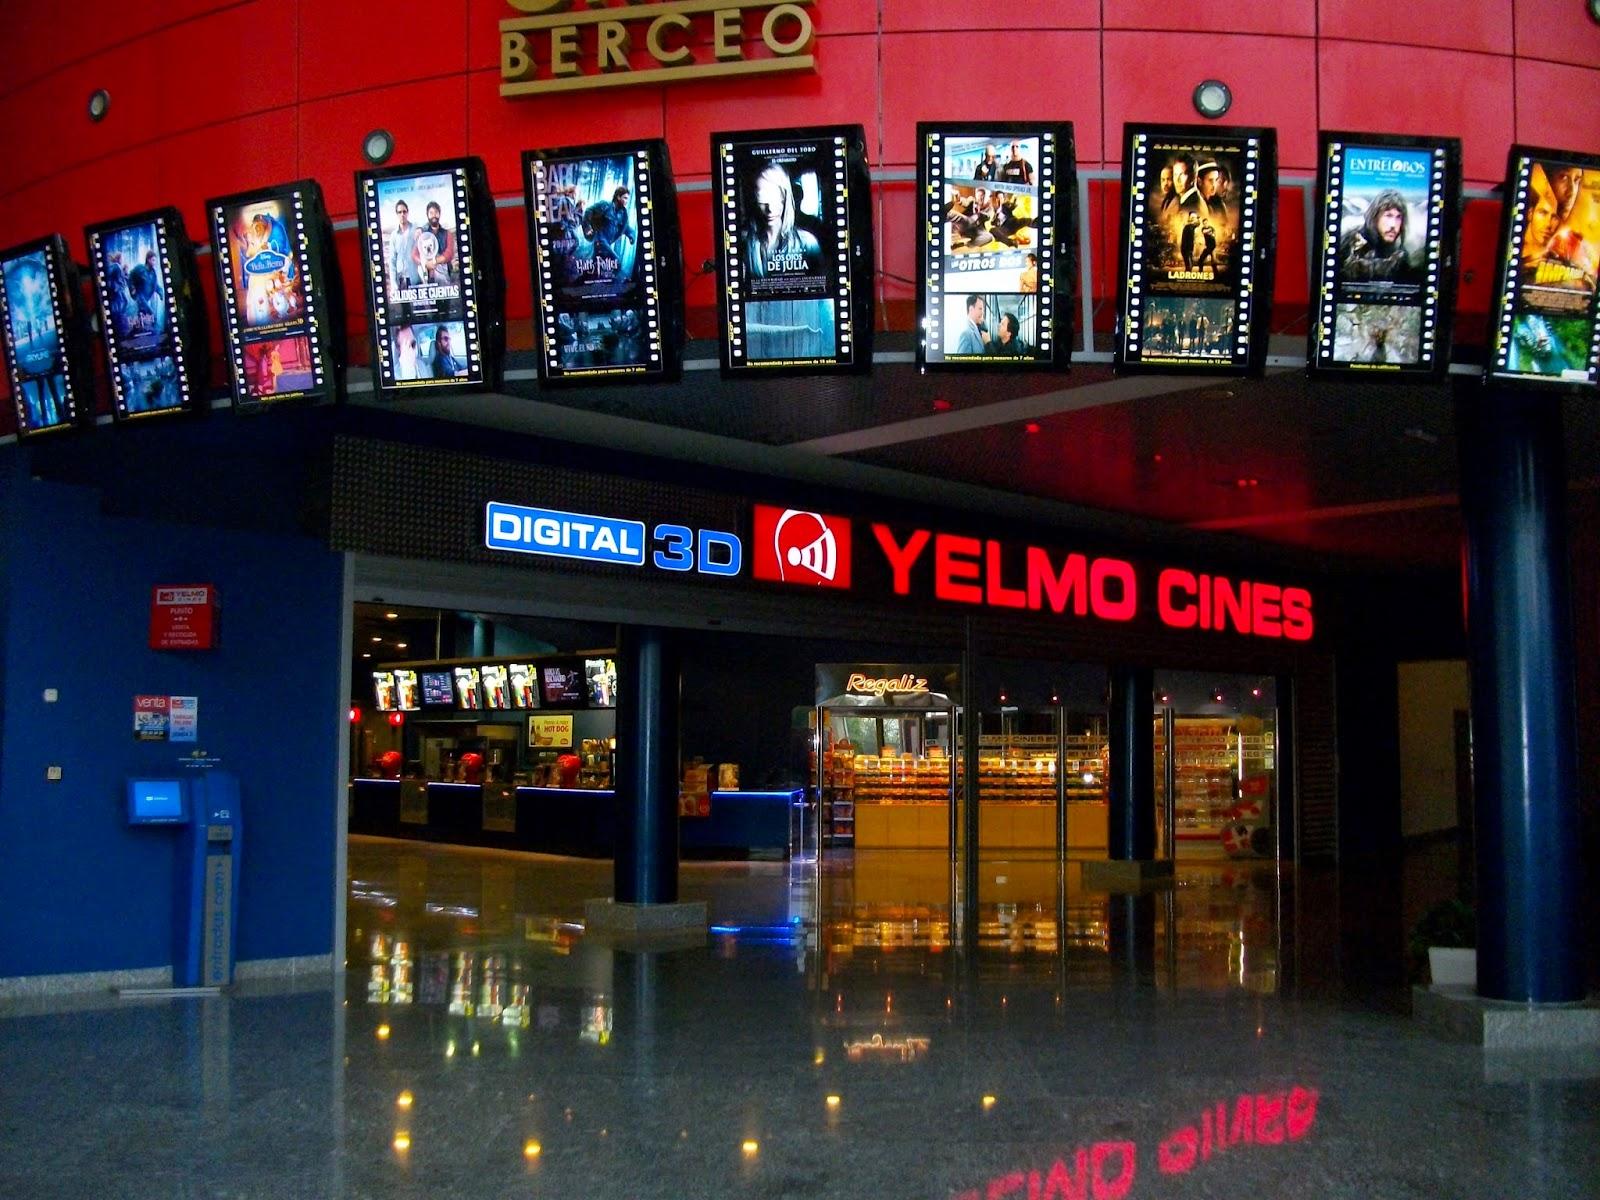 viajar a barcelona cines en barcelona On yelmo cines barcelona